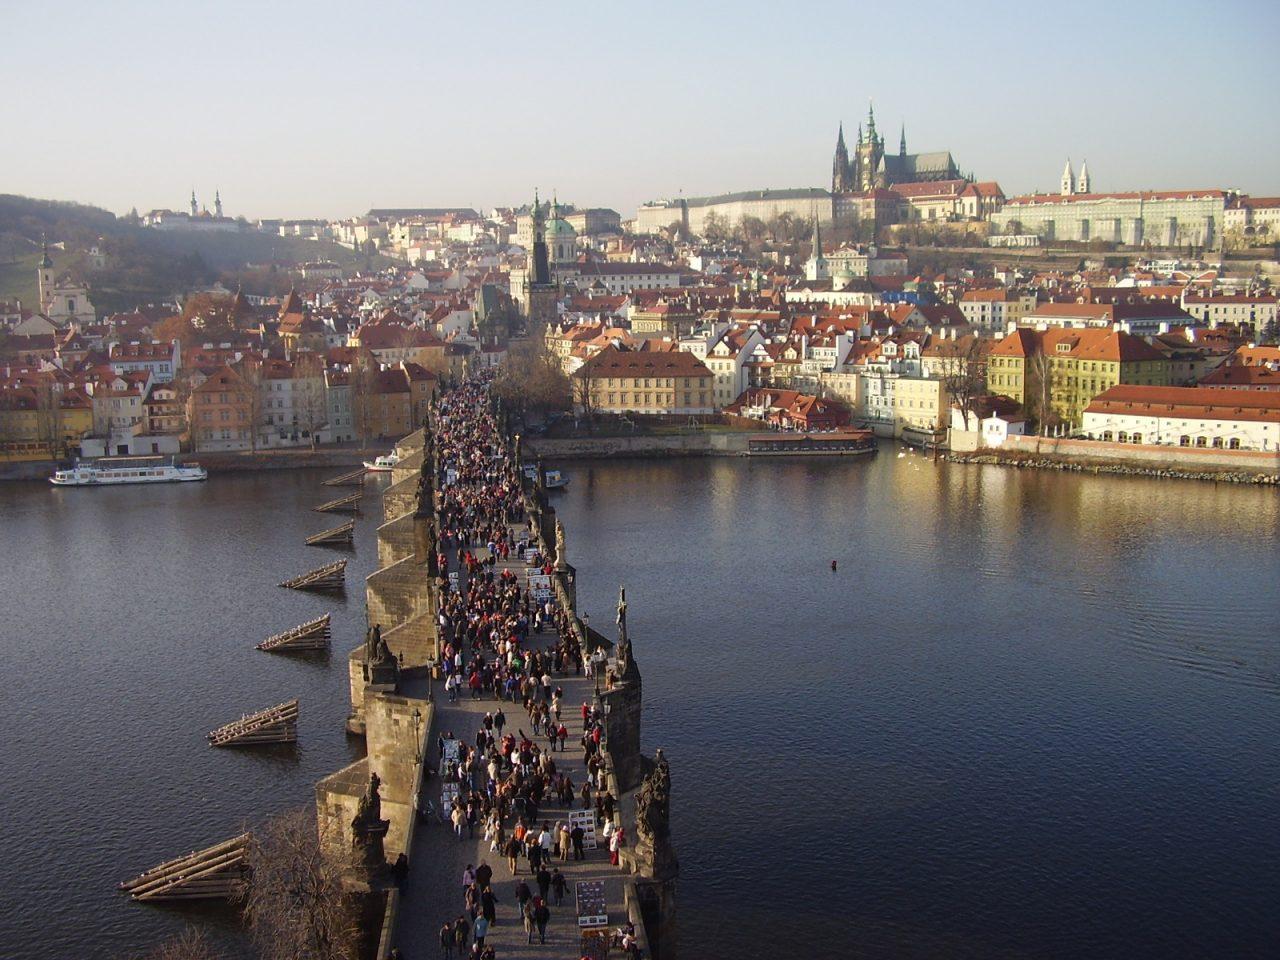 https://www.aldrimer.no/wp-content/uploads/2017/01/Prague_2006-11_052-1280x960.jpg